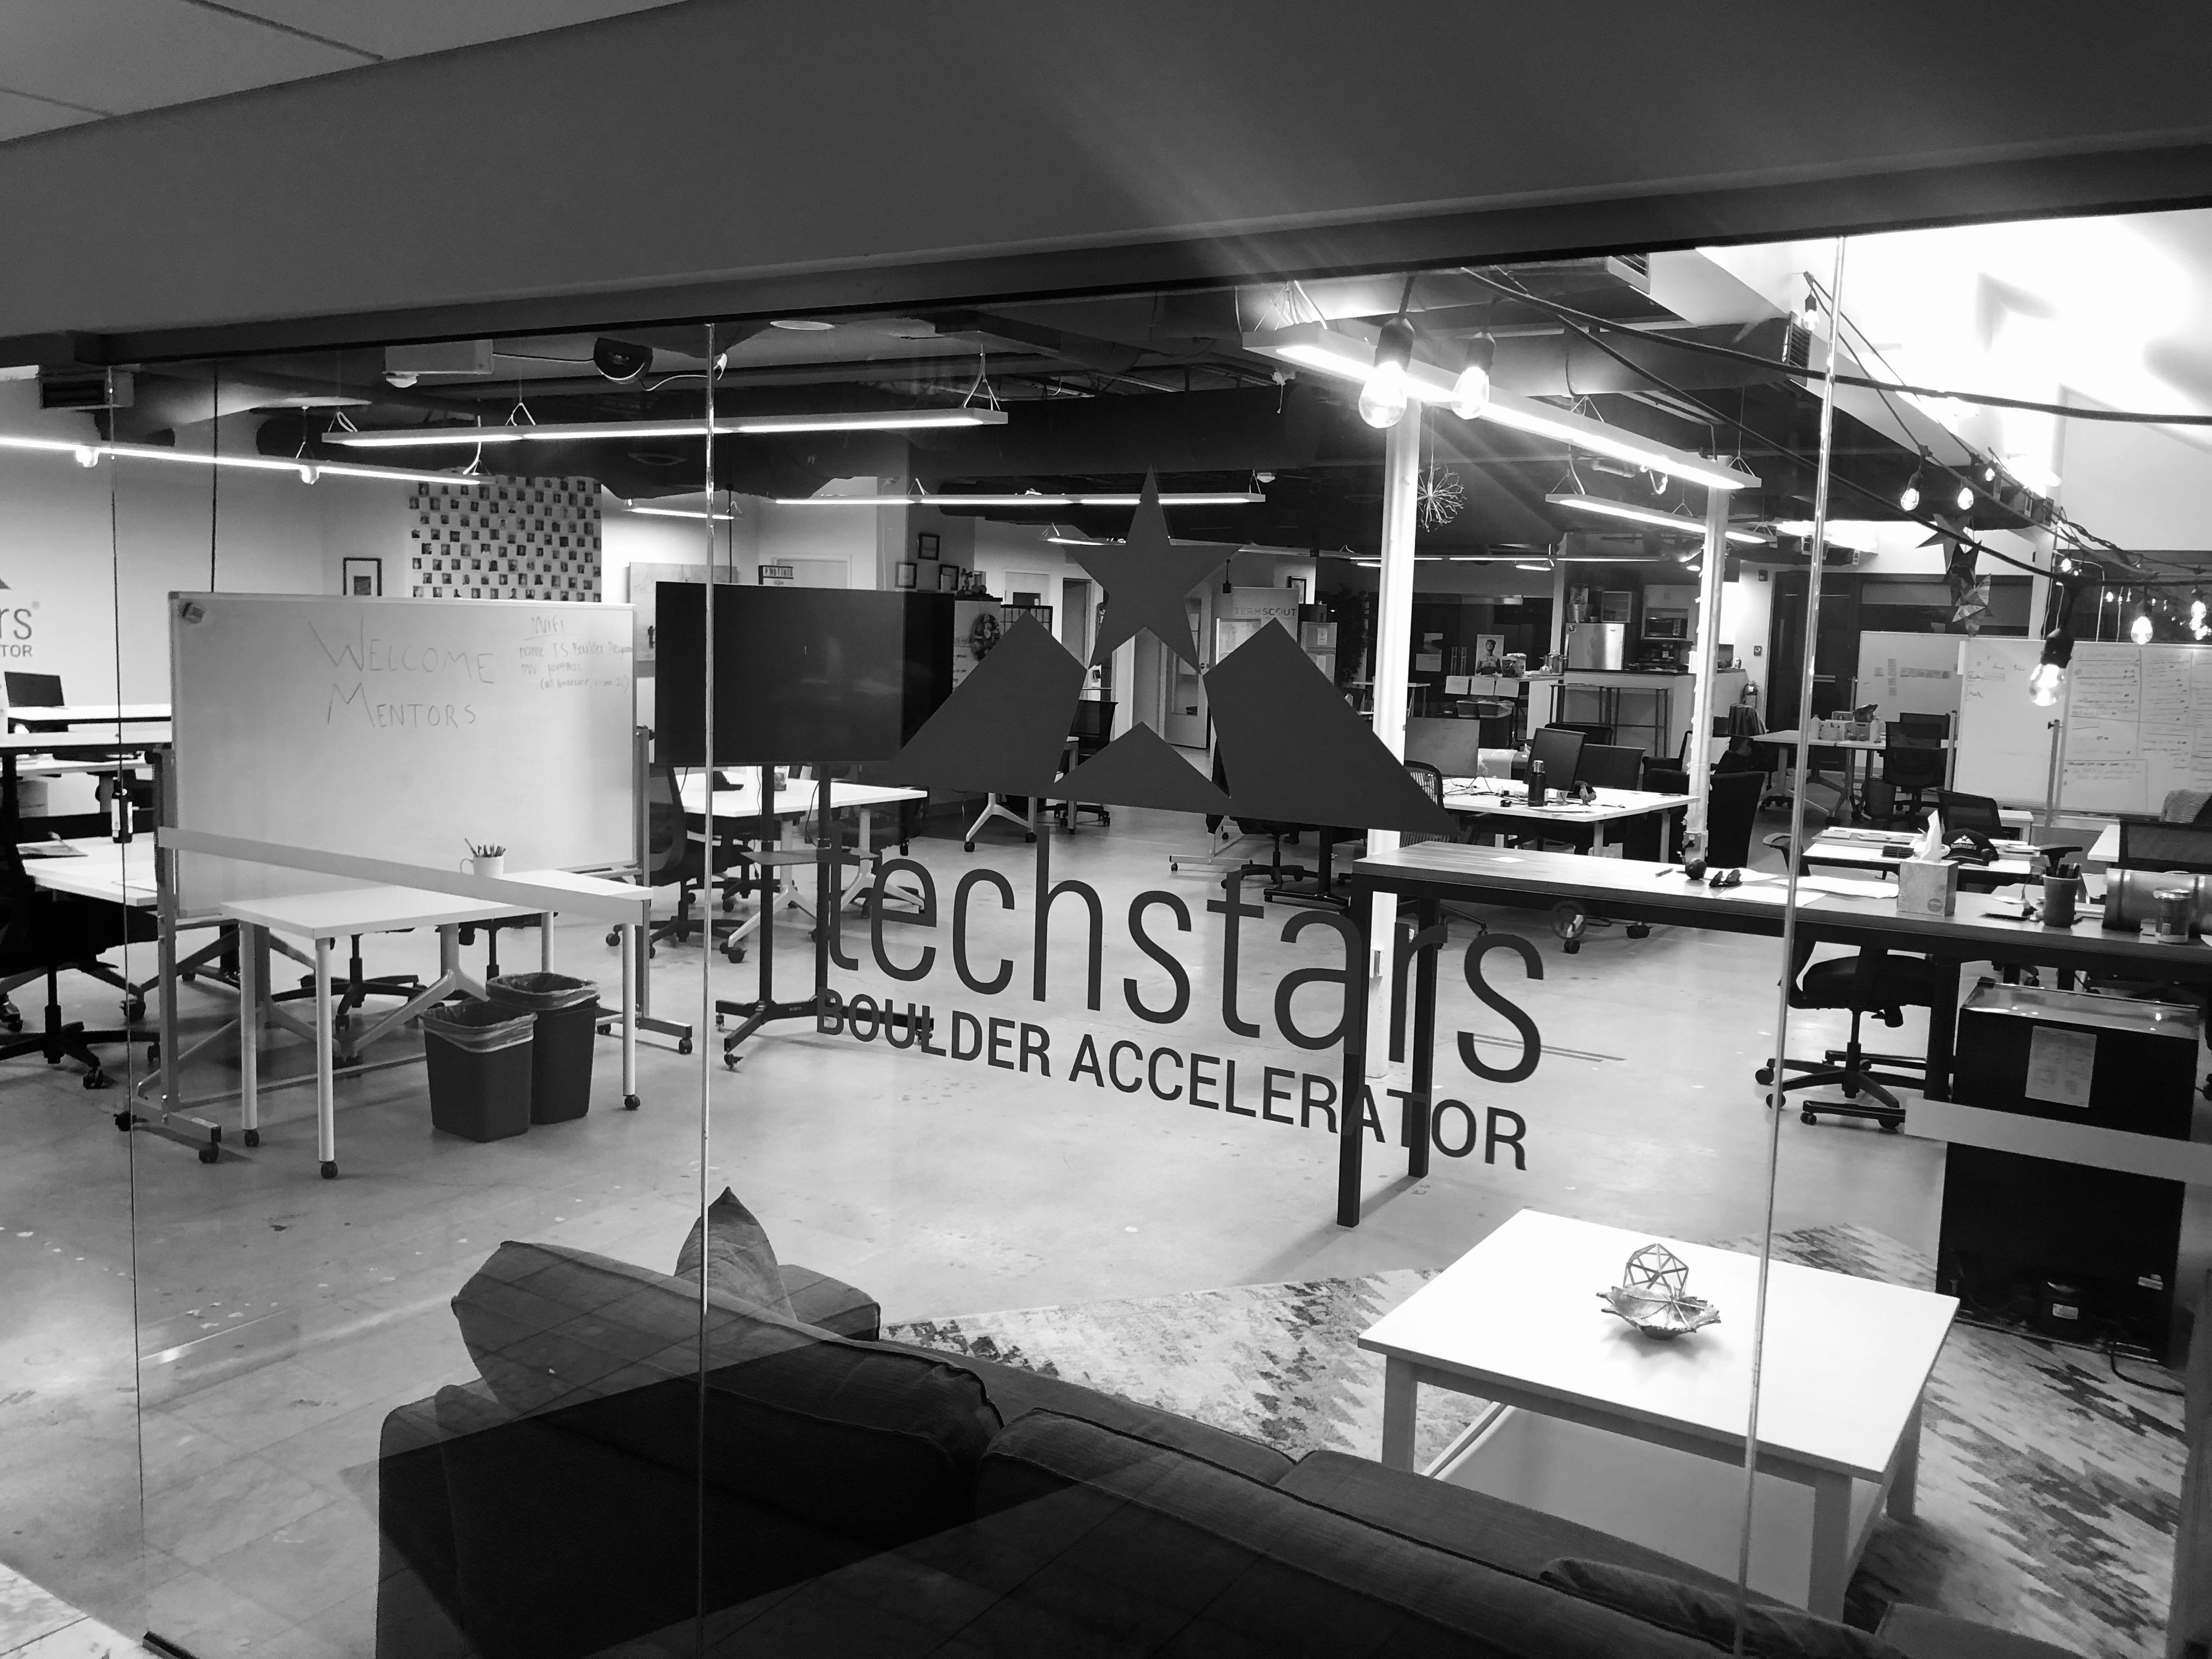 Techstars Boulder Accelerator 2020: Week Two Reflection - Mentor Madness